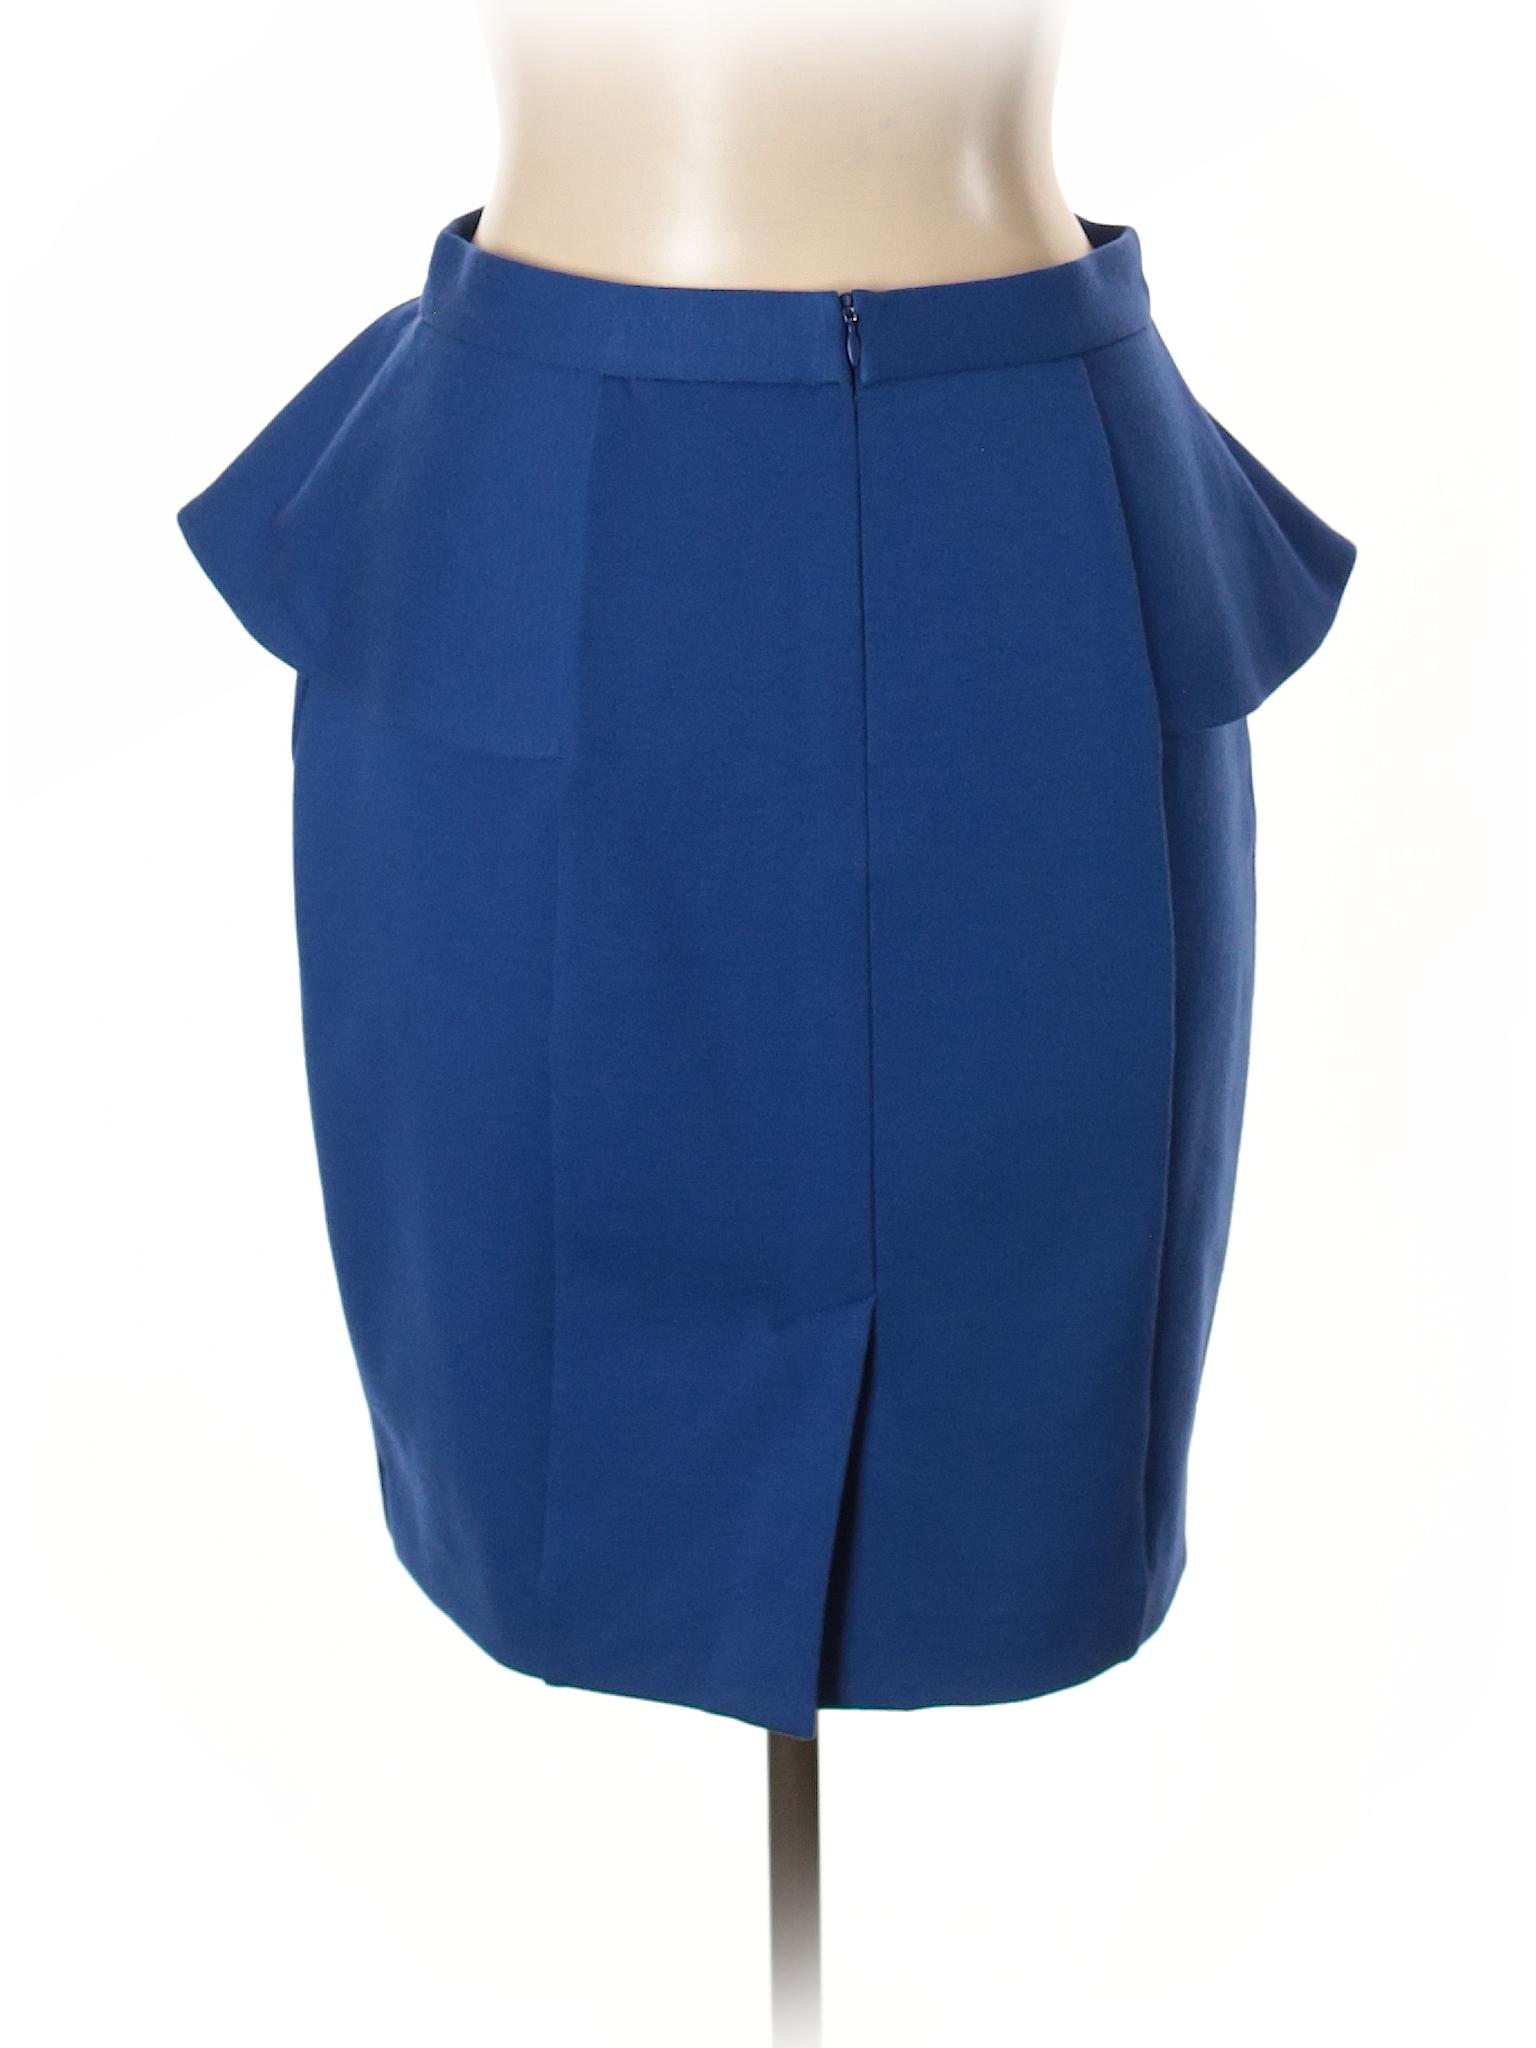 Boutique Club Casual Club Monaco Boutique Skirt Monaco Tq0xdq1wr